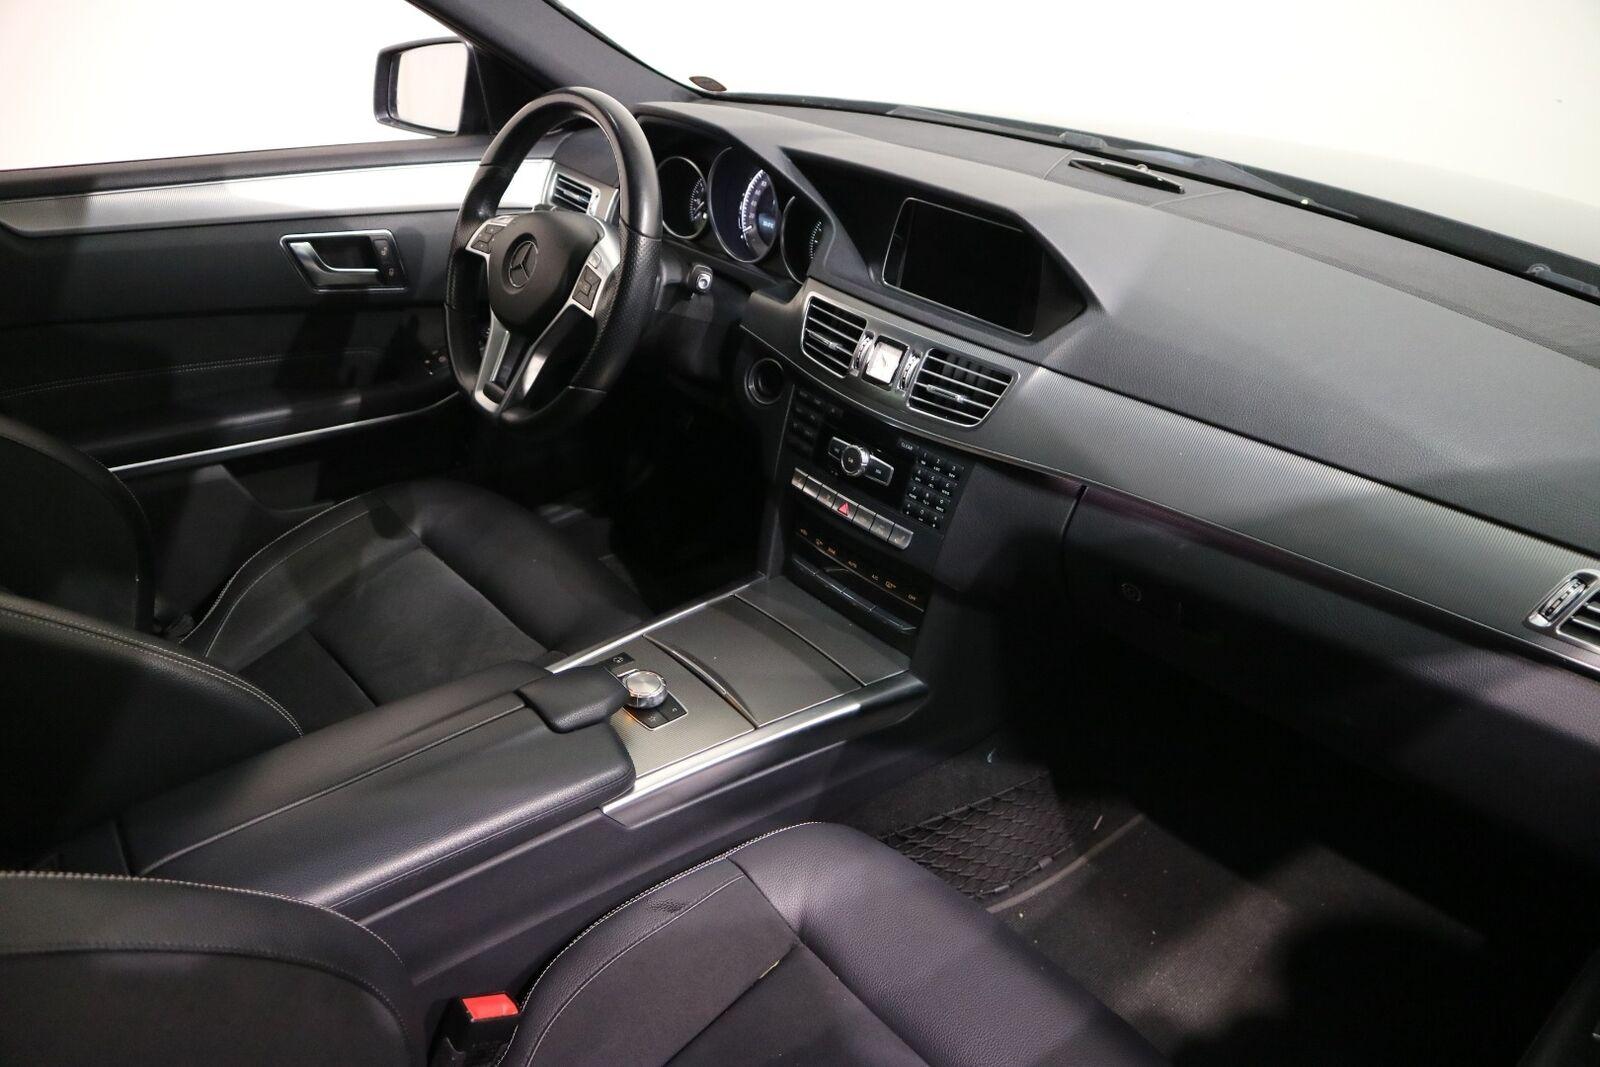 Mercedes E220 2,2 CDi Avantgarde AMG stc. aut. - billede 6